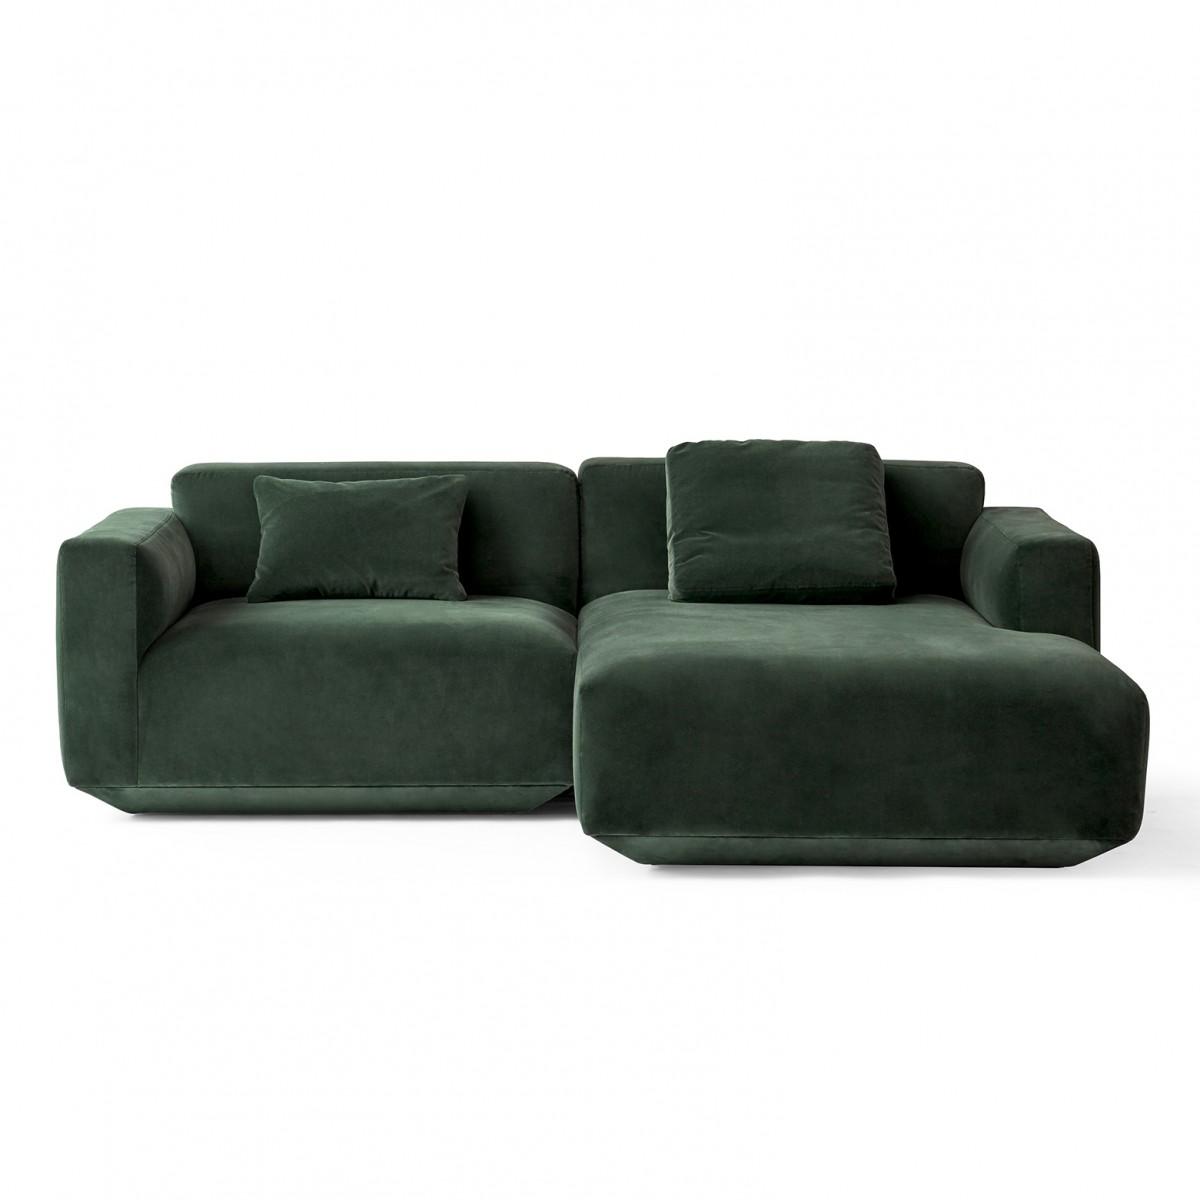 sofa develius par tradition. Black Bedroom Furniture Sets. Home Design Ideas